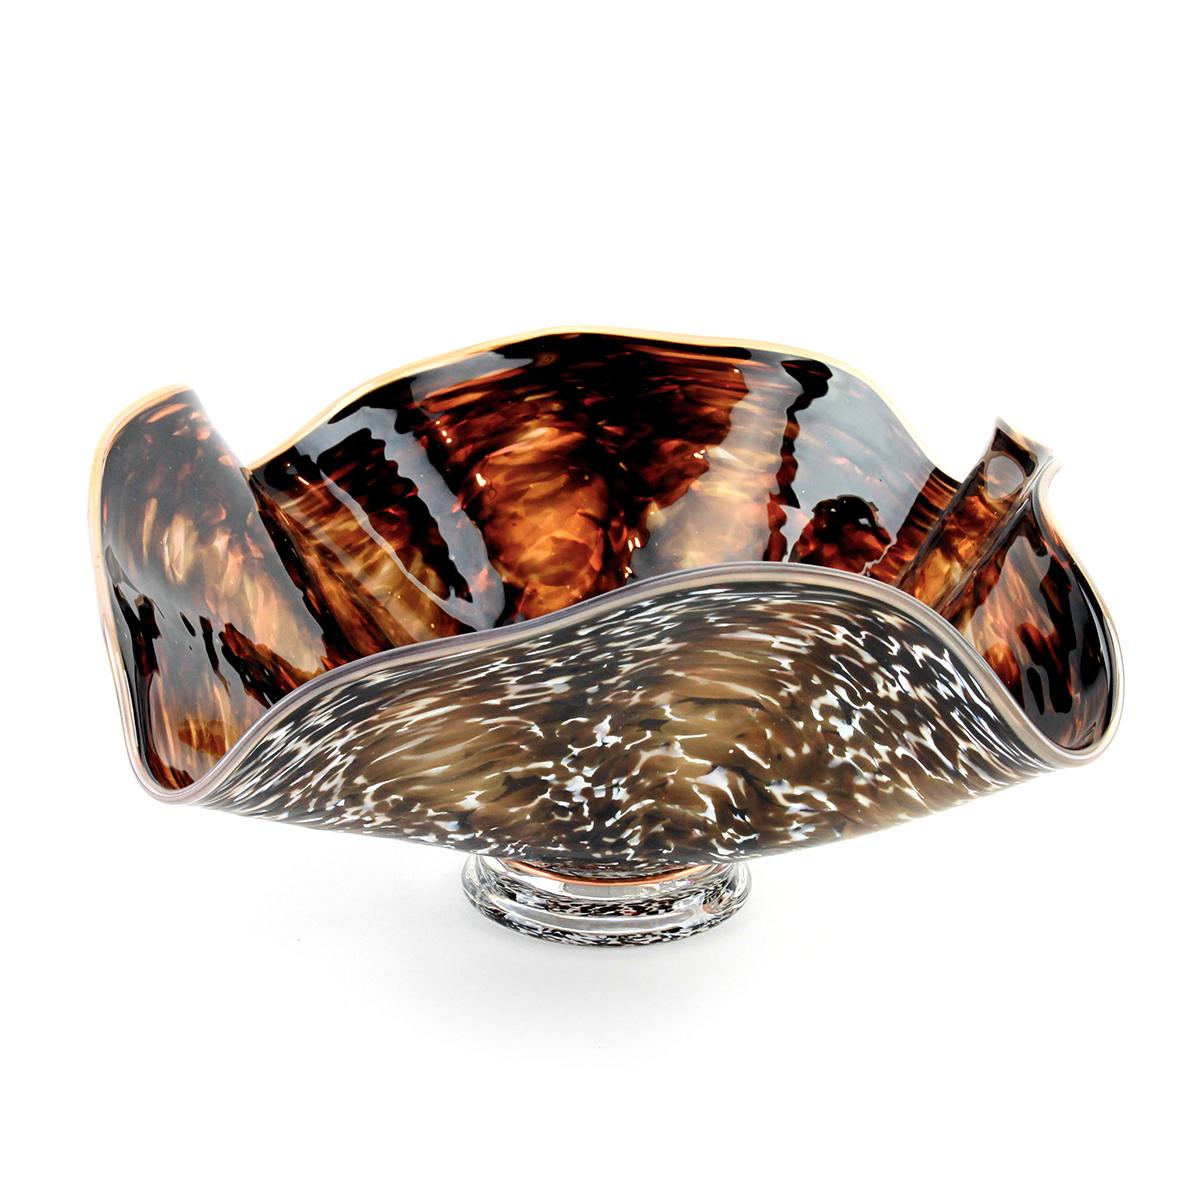 Brown Banana Glass Bowl - alternate